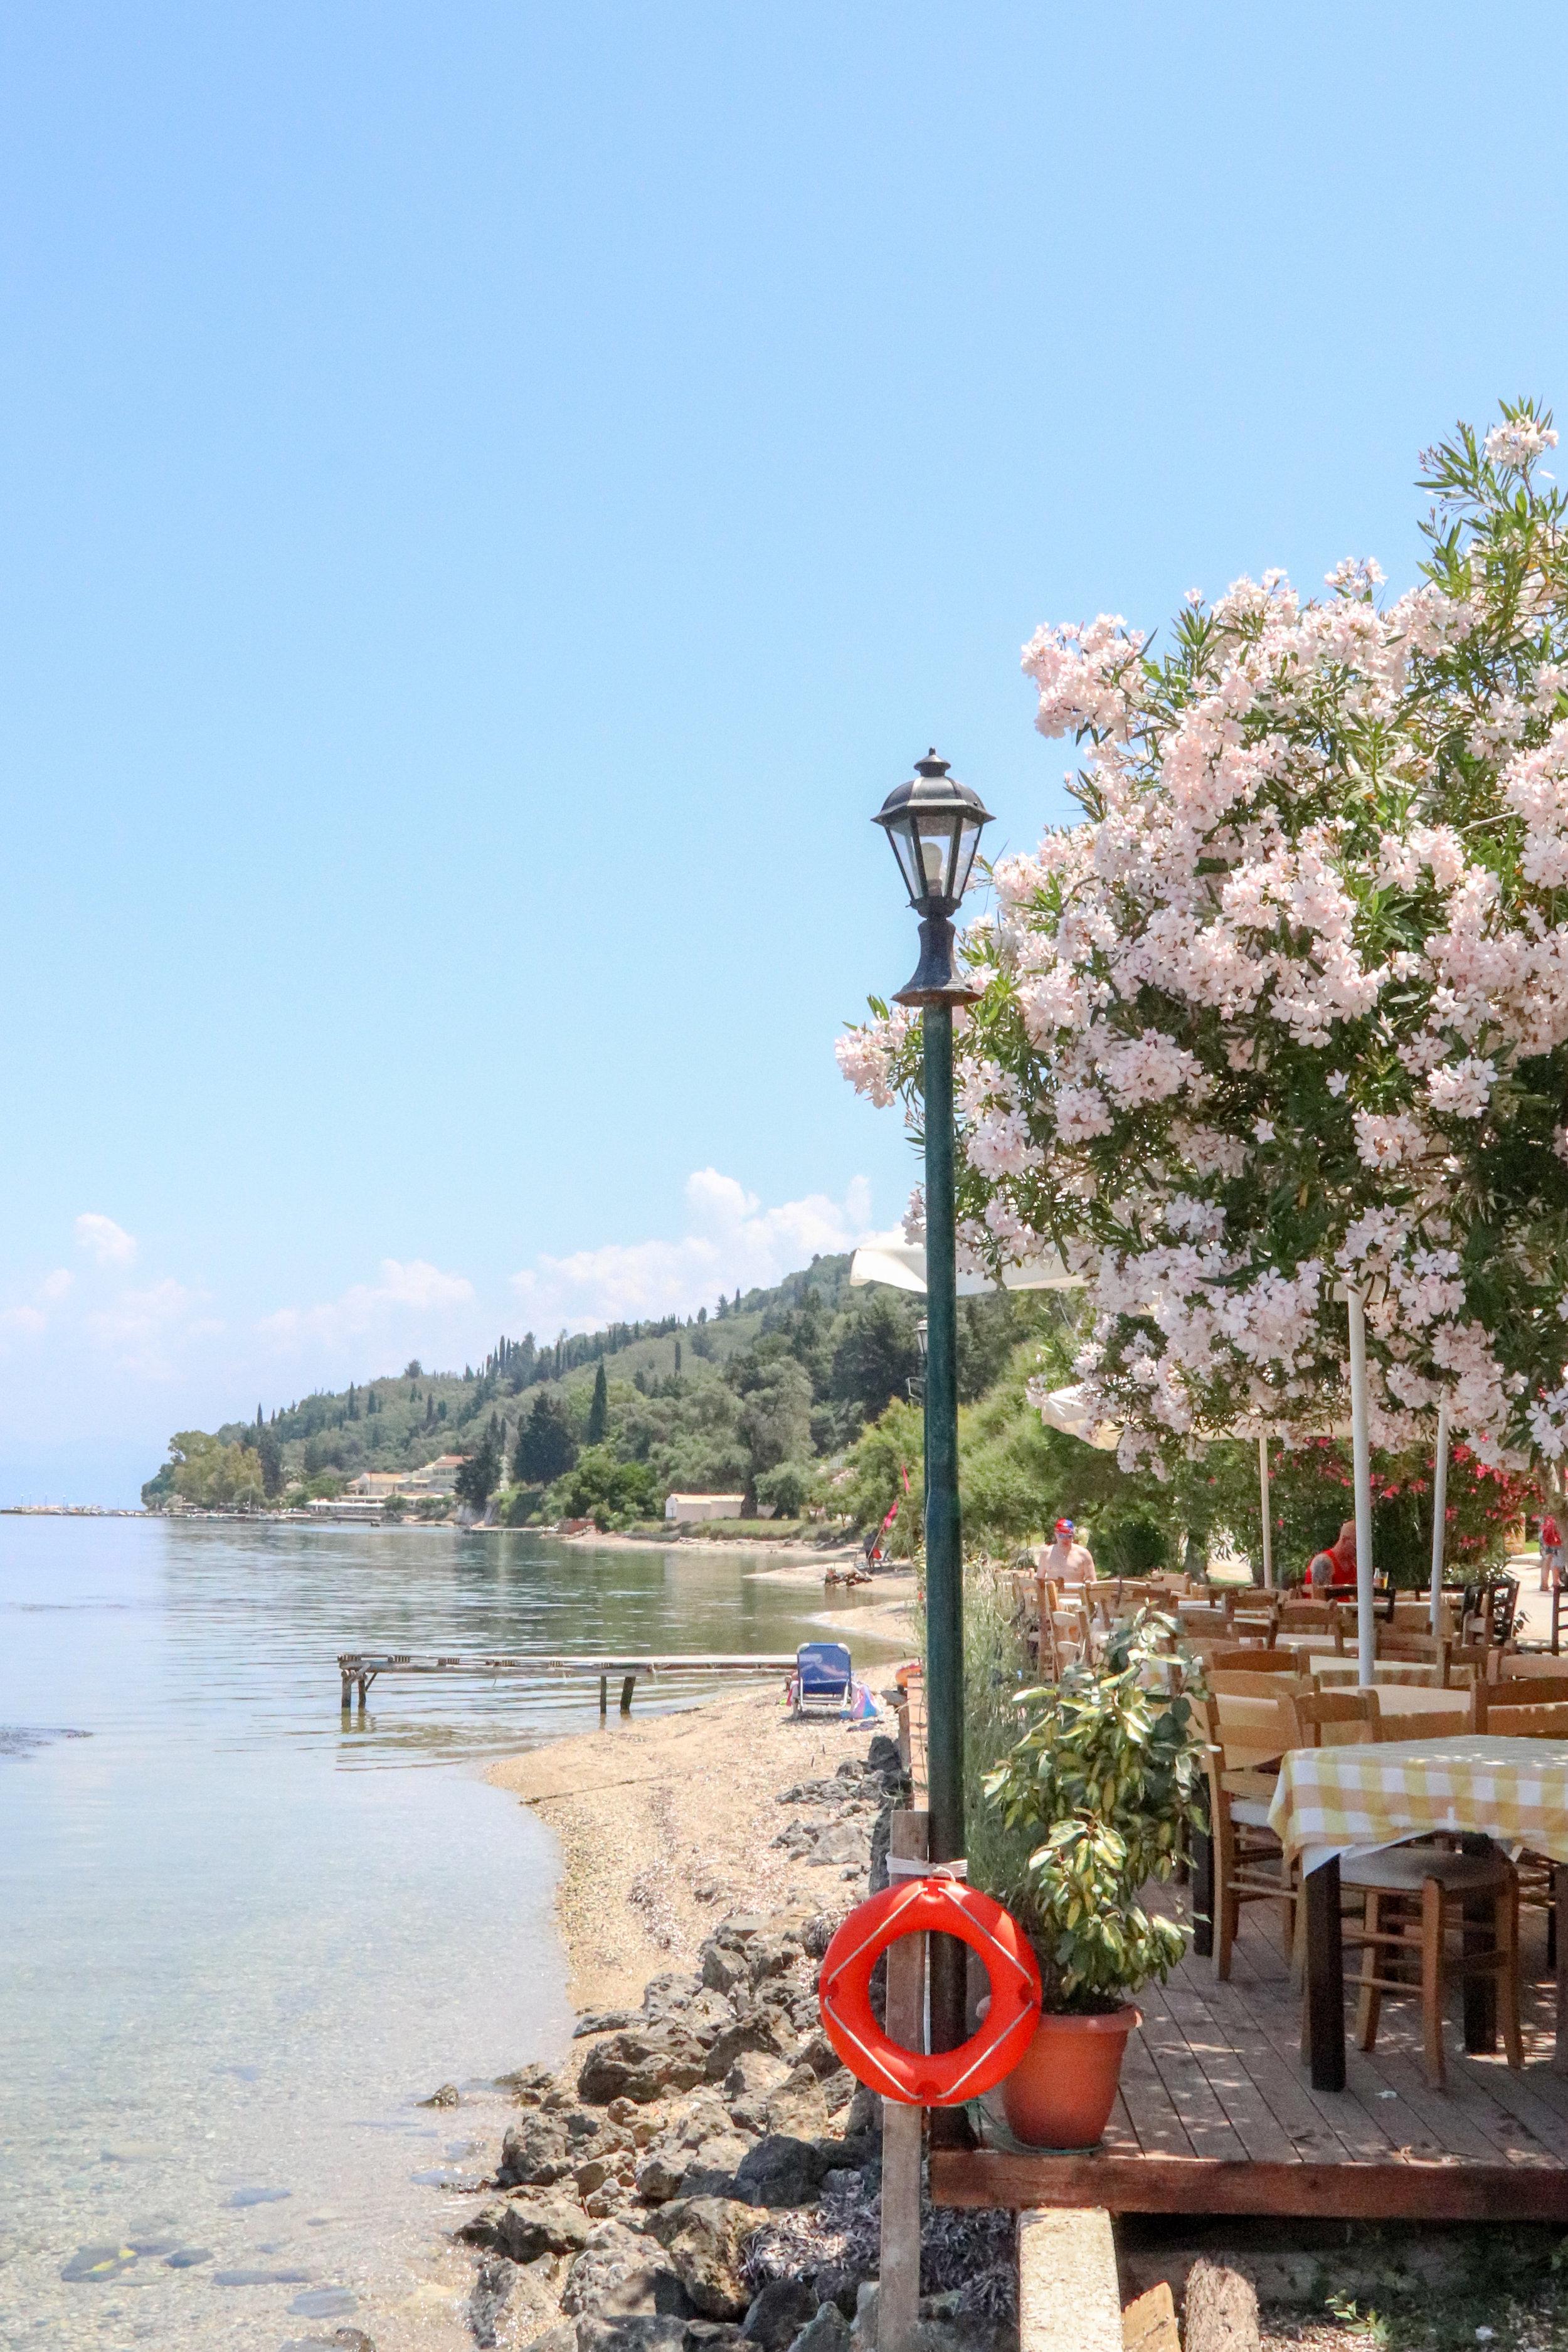 Taverna in Boukari, Corfu, Greece